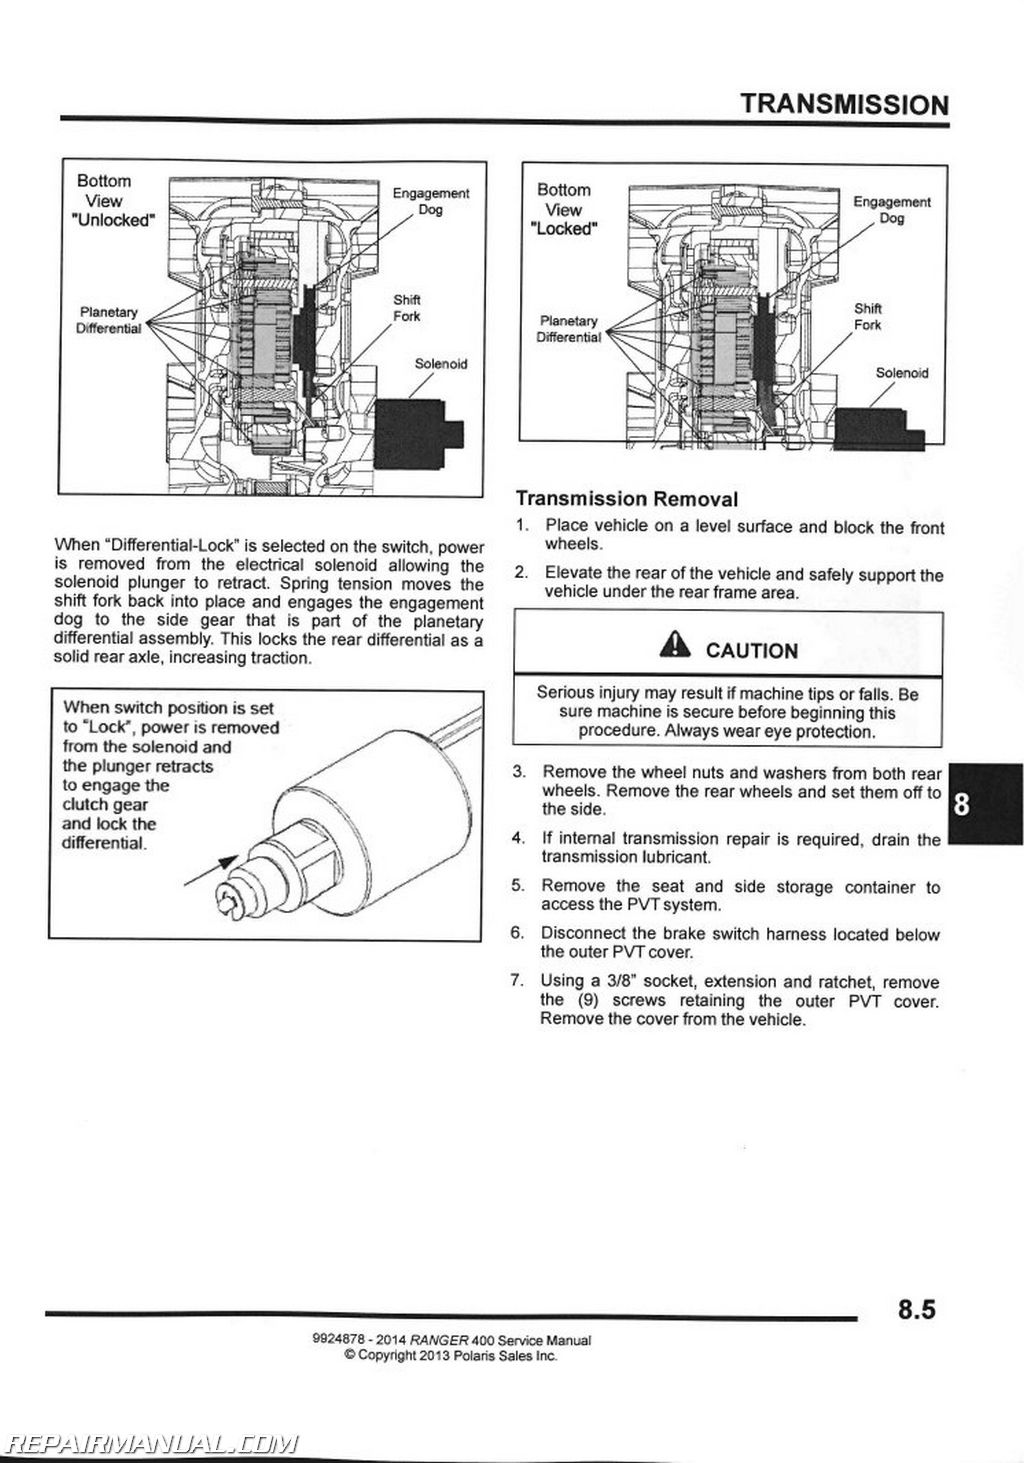 polaris indy 500 manual pdf